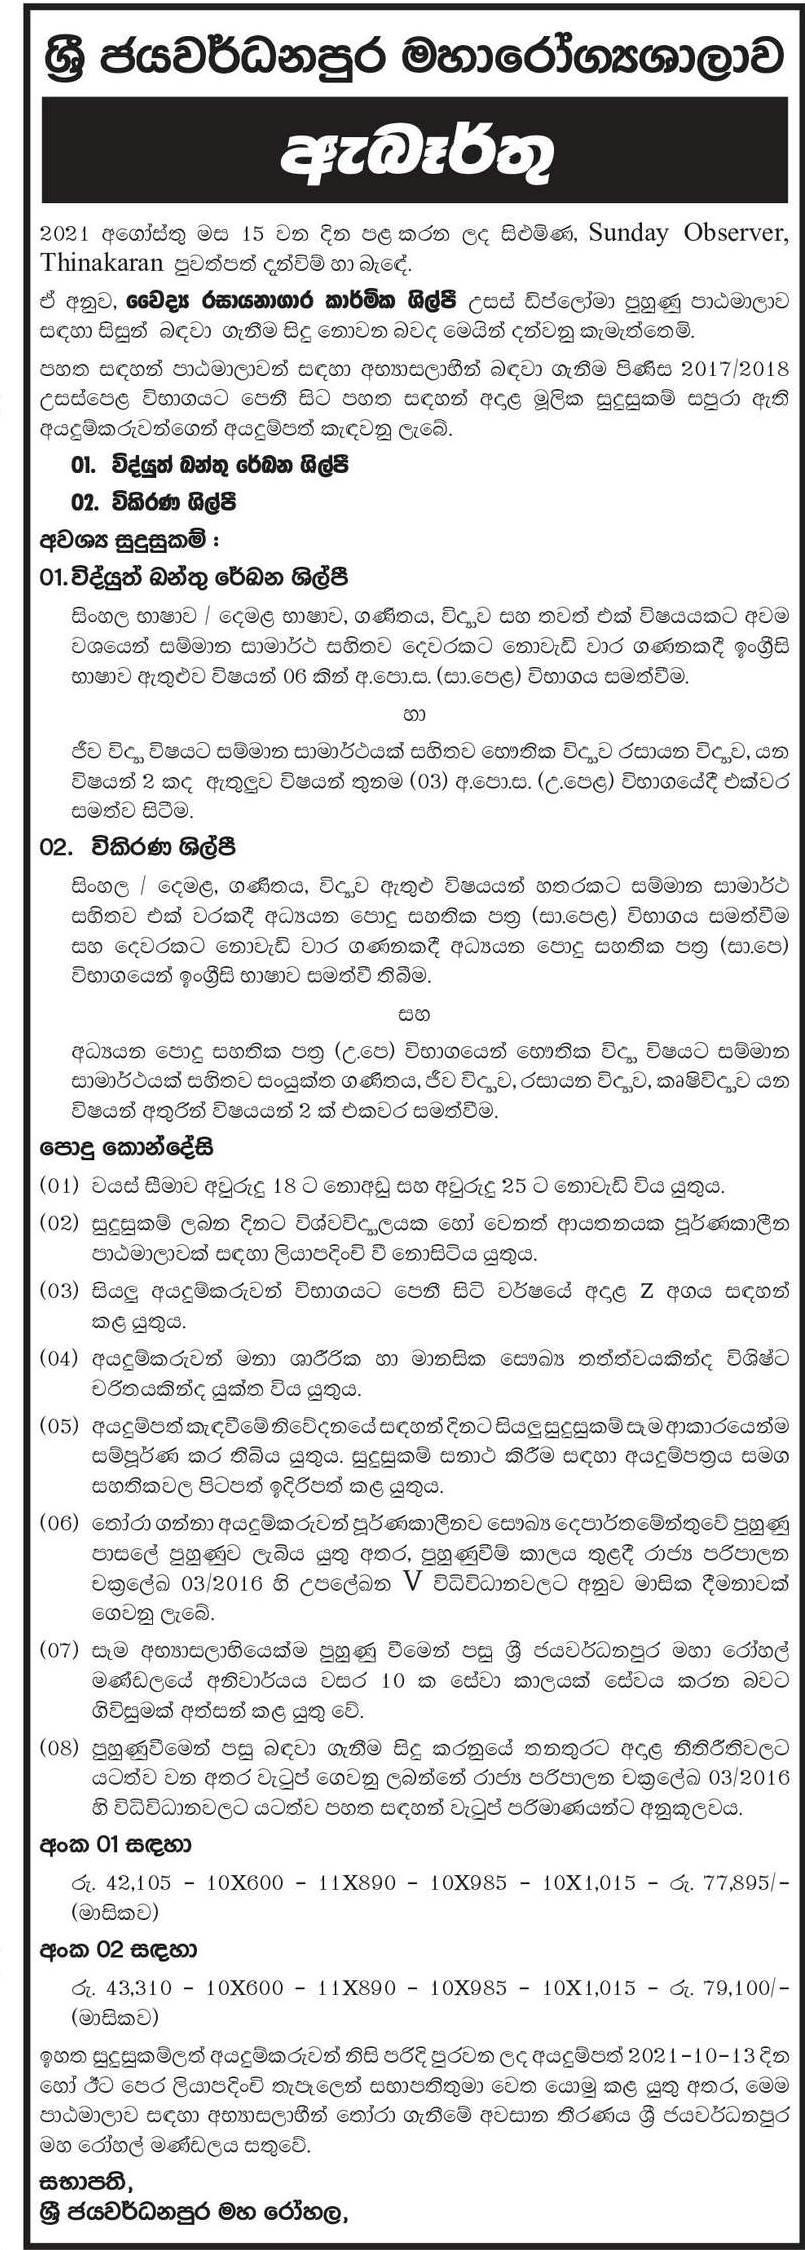 Electro Cardiographer, Radiographer - Sri Jayewardenepura General Hospital Sinhala